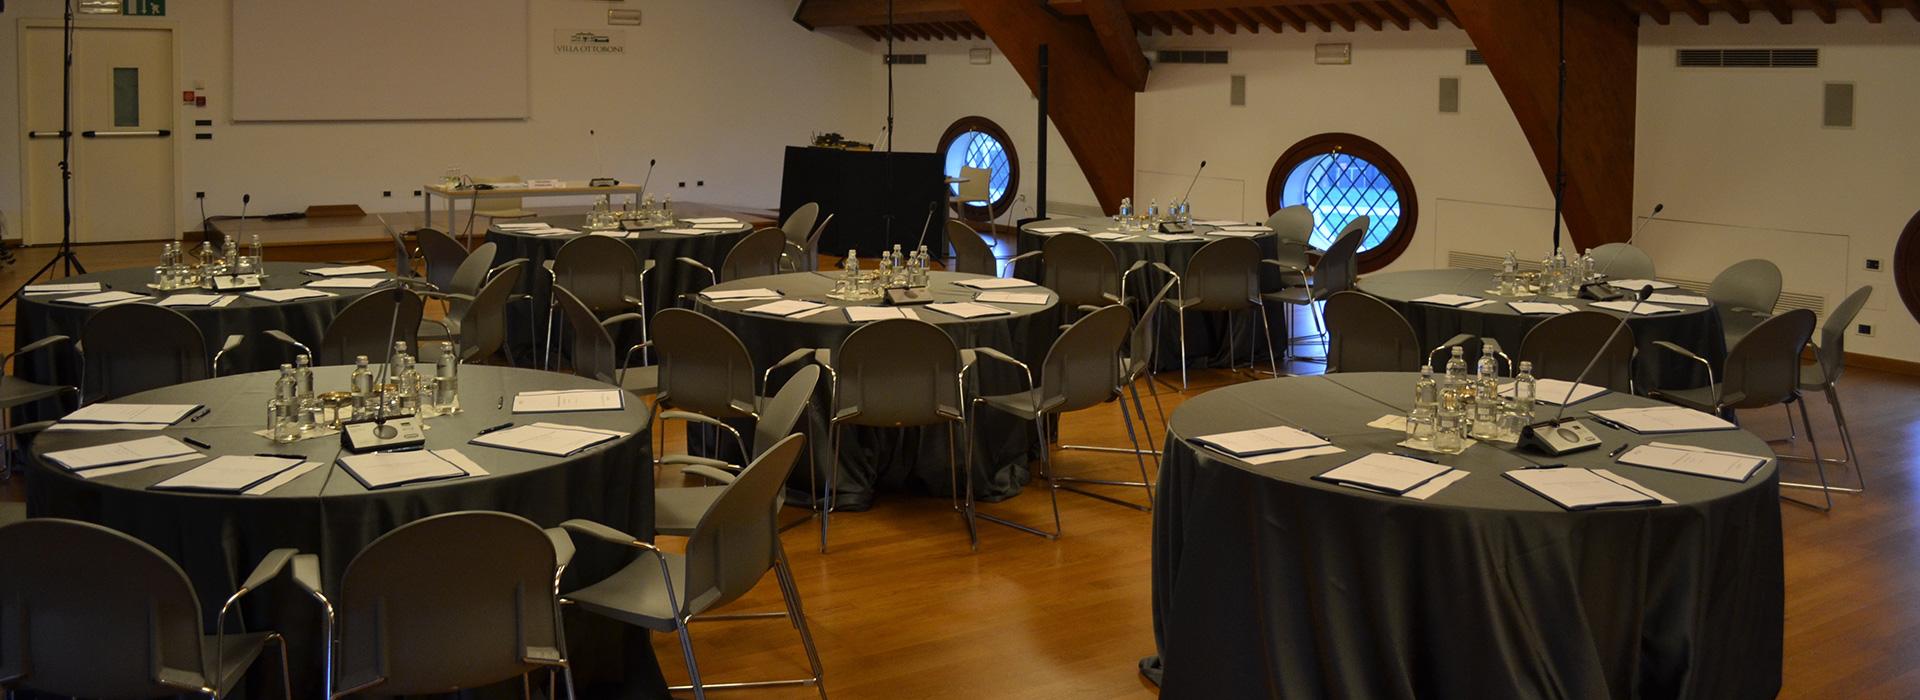 sala meeting a Padova